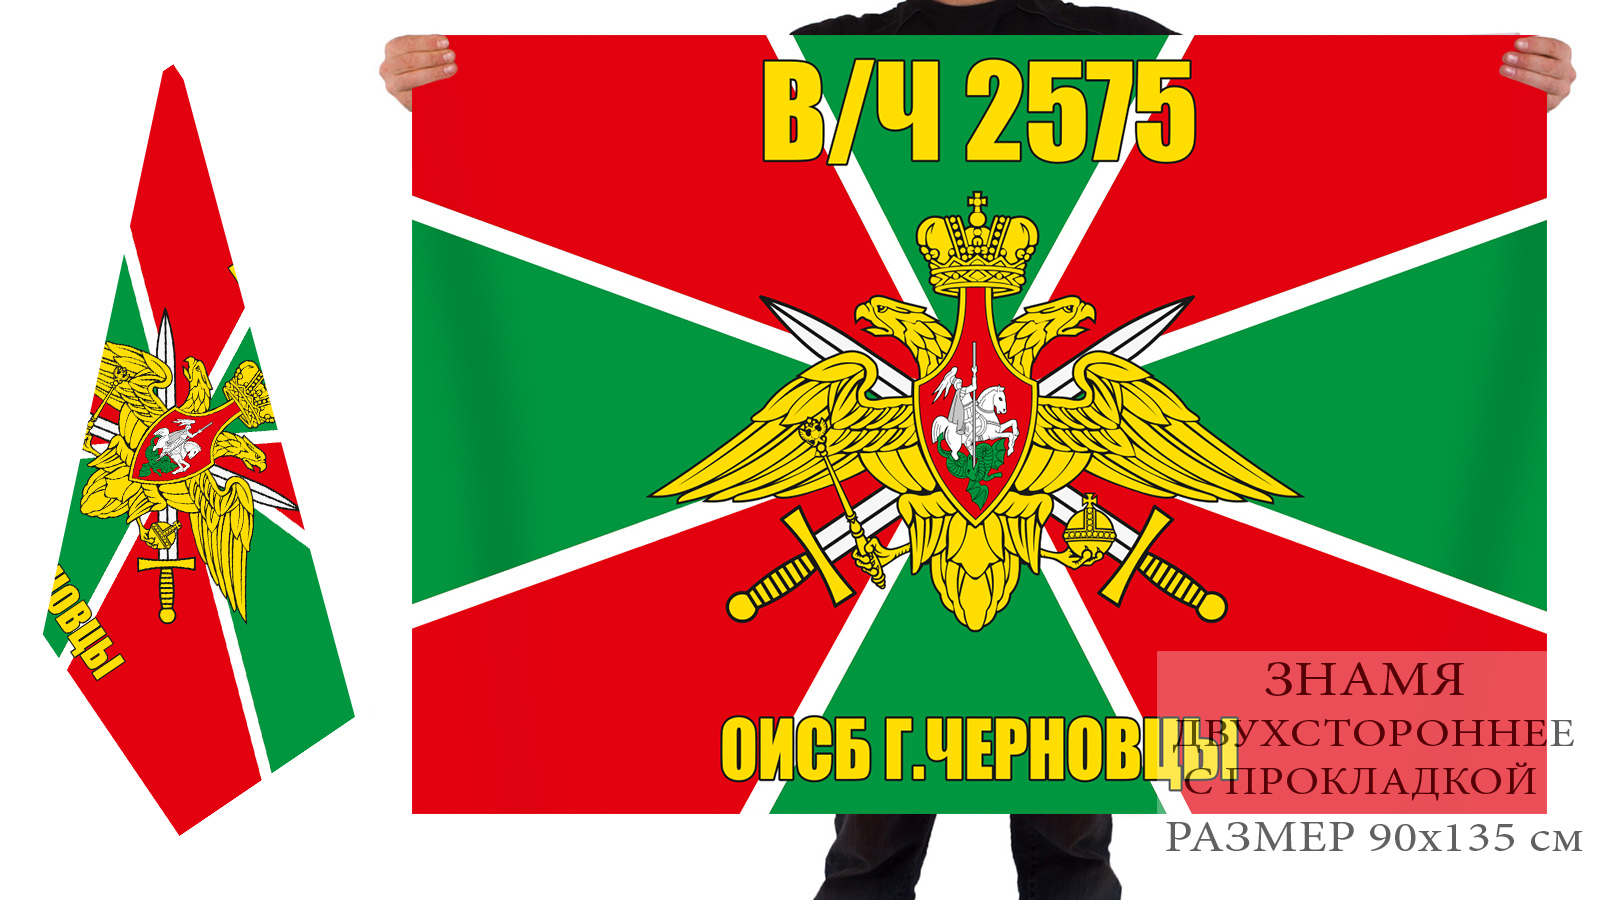 Двухсторонний флаг ОИСБ г.Черновцы в/ч 2573